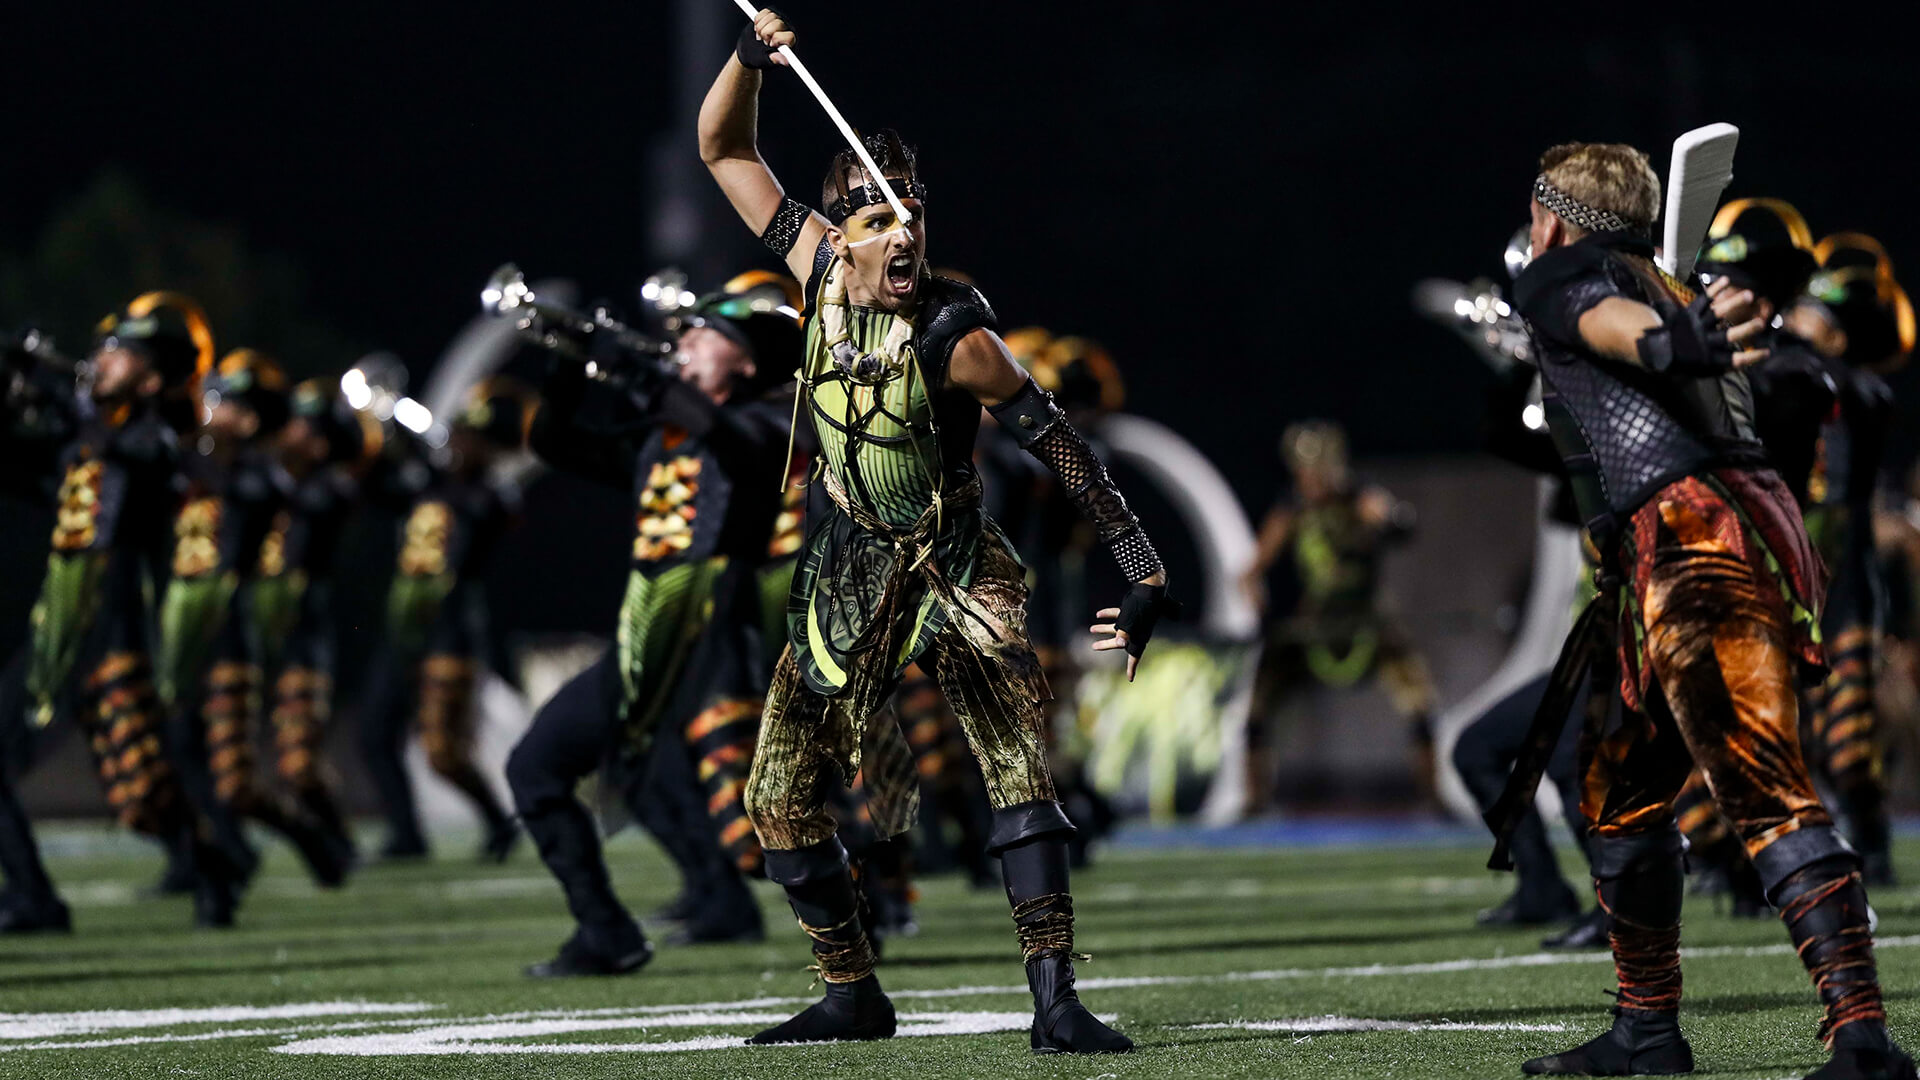 Carolina Crown roars through Allentown